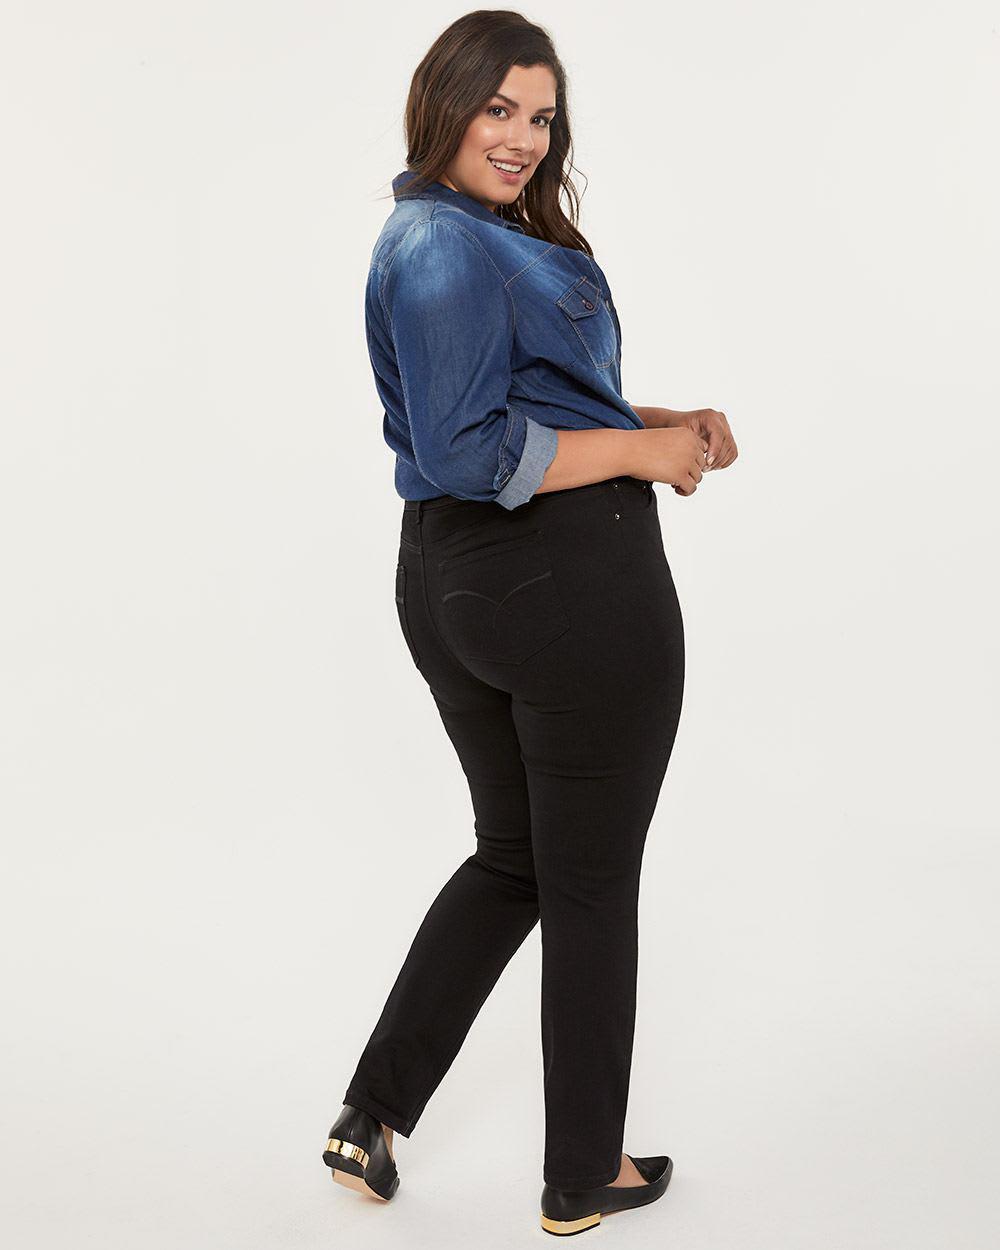 c0fe7b0b080e45 Lyst - Addition Elle Petite Slightly Curvy Fit Straight Leg Black Jean -  D/c Jeans in Black